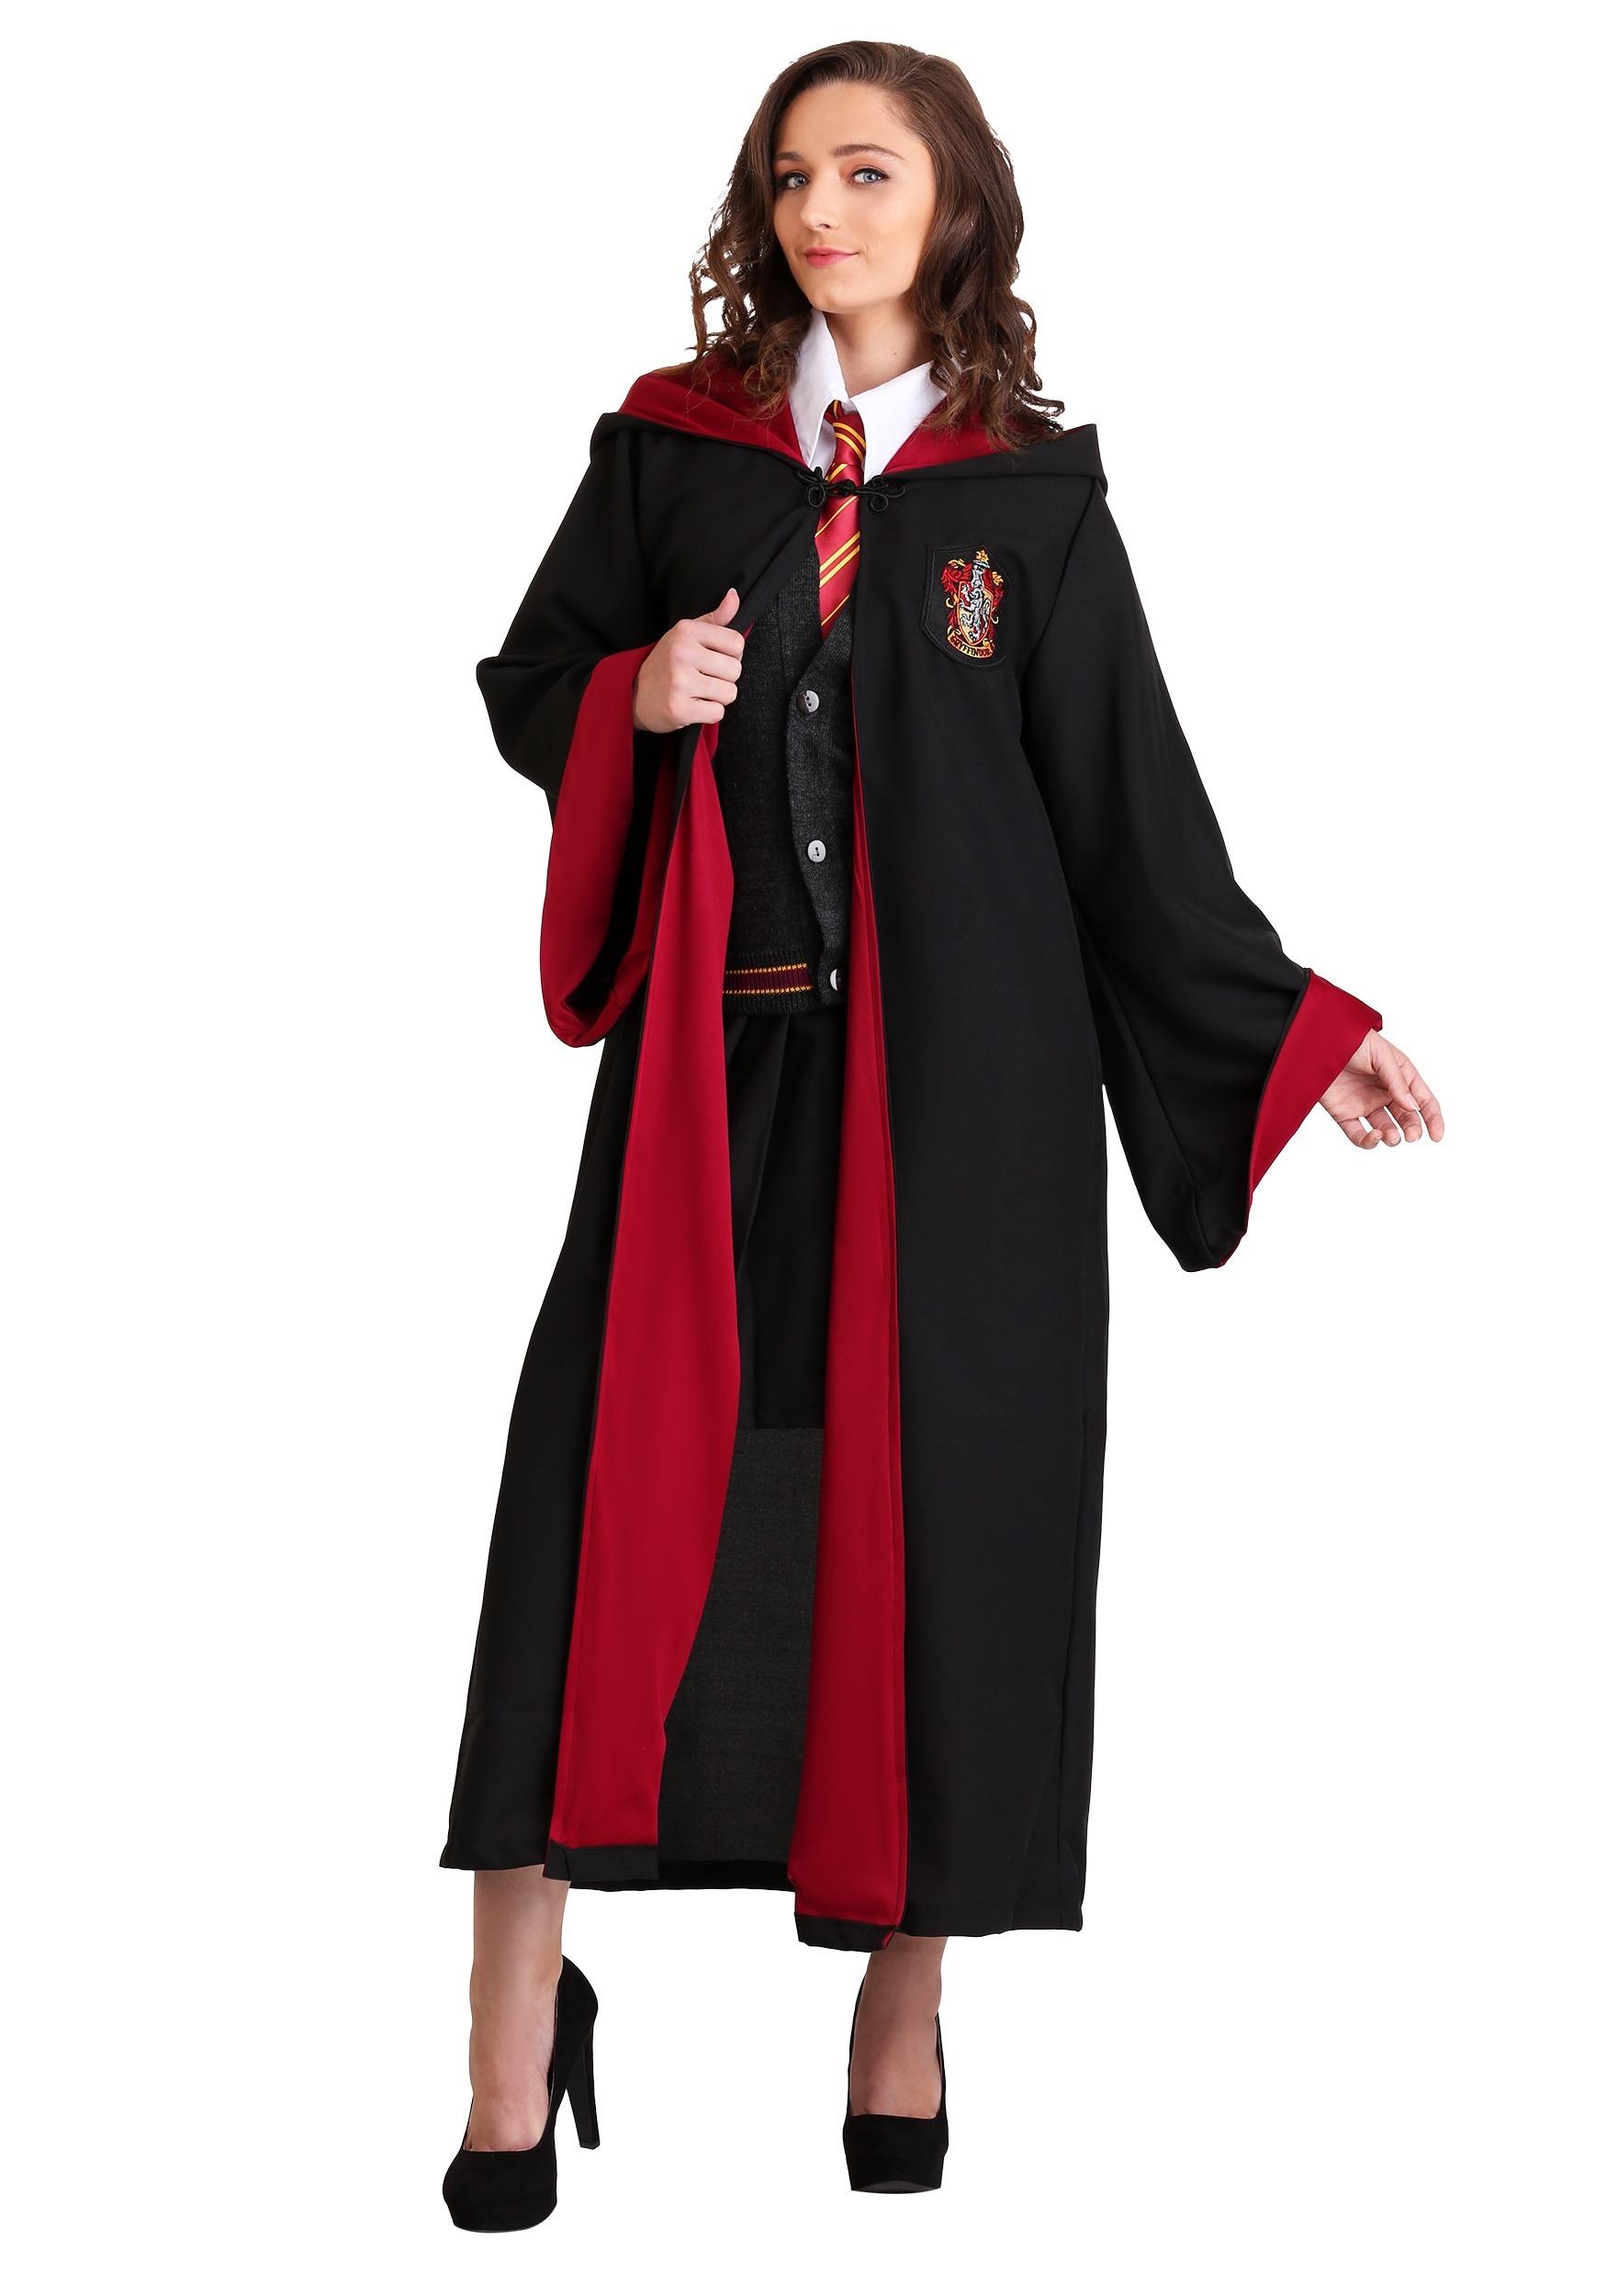 Deluxe Hermione Costume for Women